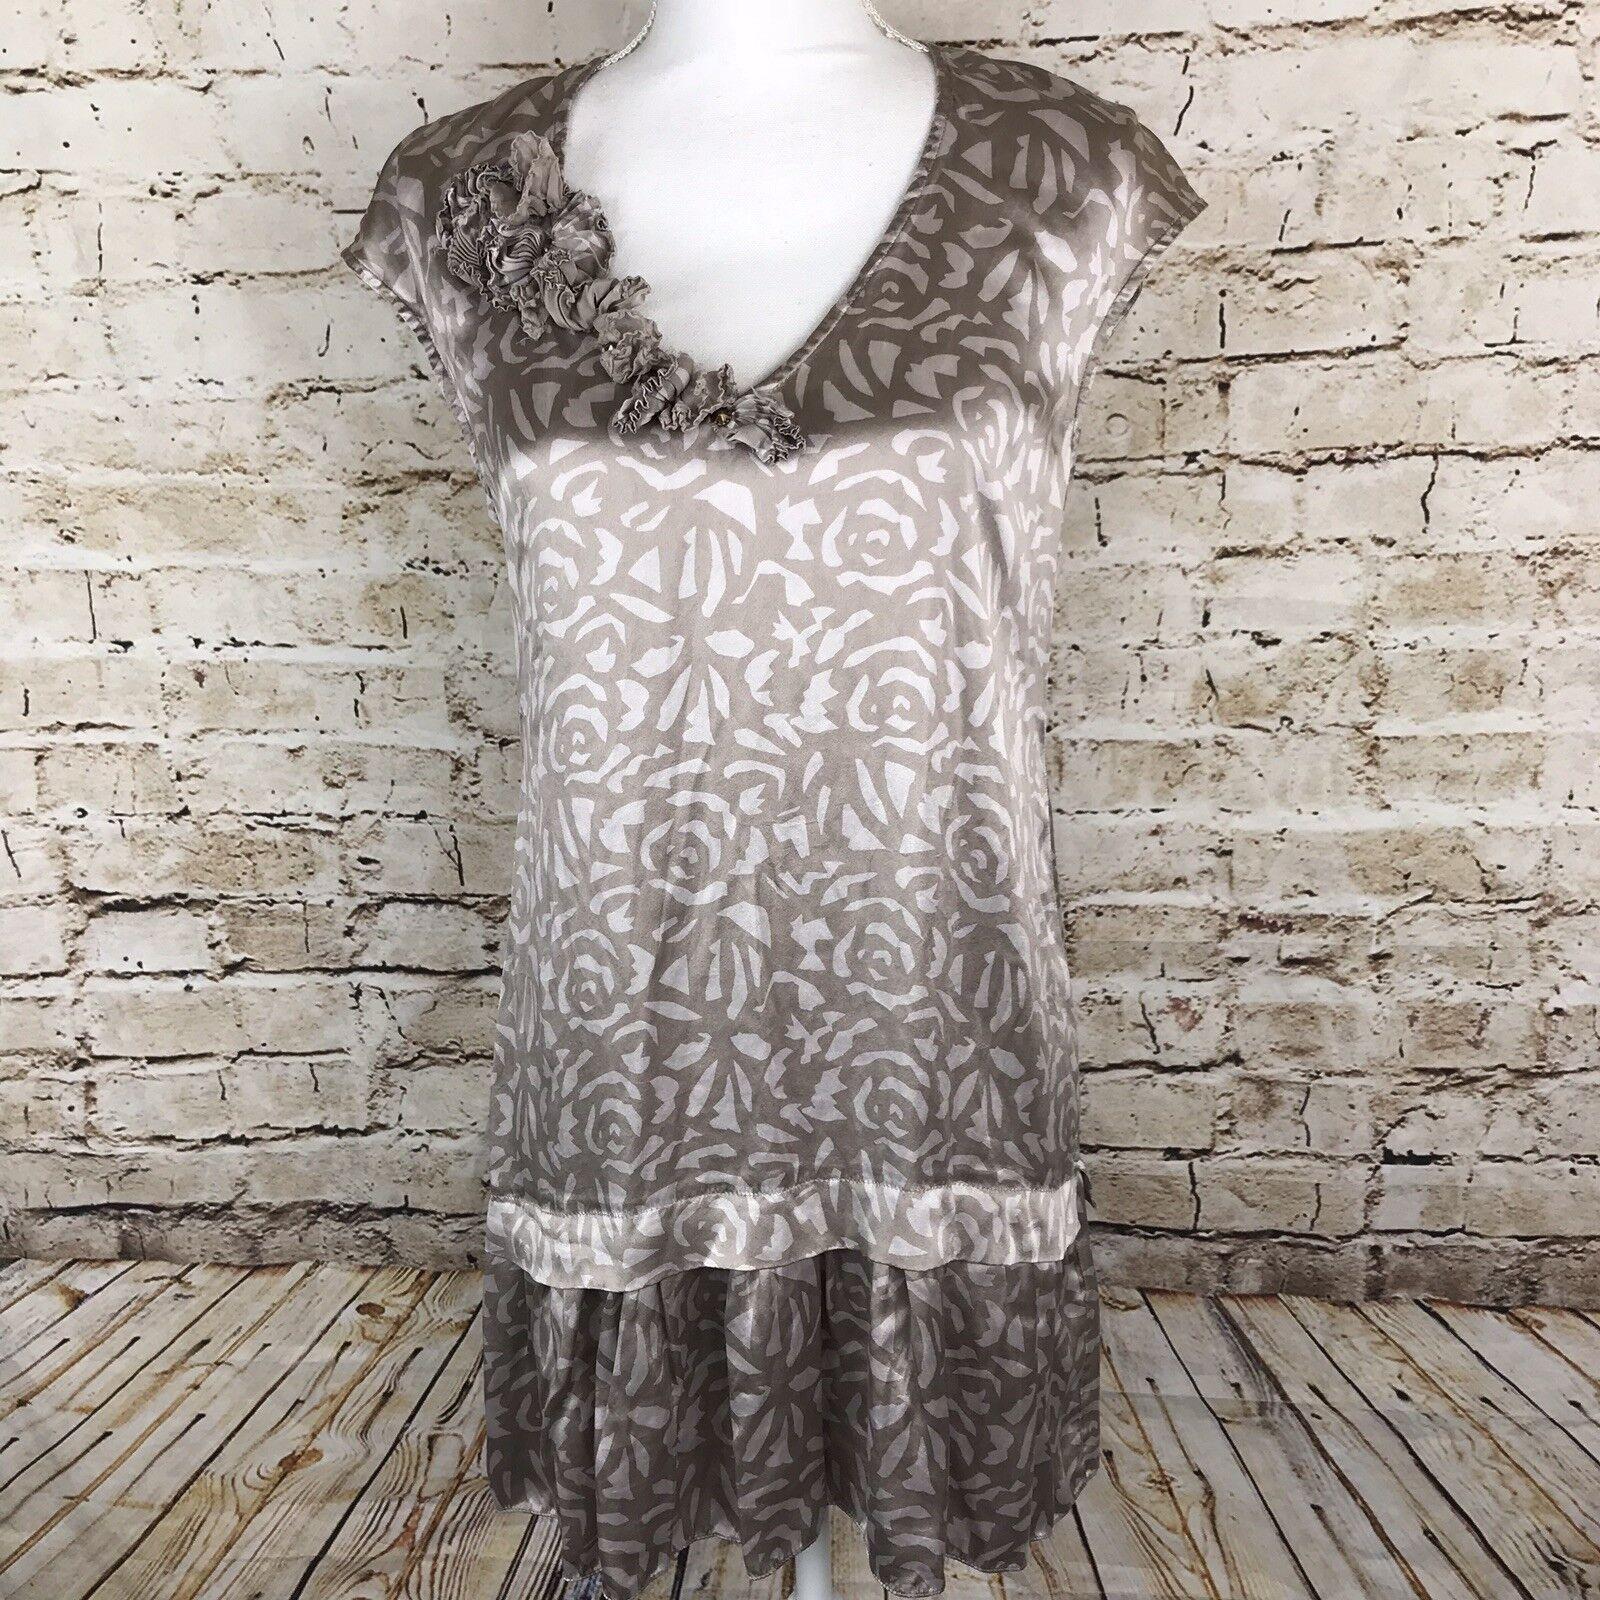 Rebecca Taylor 100% Silk damen Dress US Größe 6 braun Rosa Floral Print Ruffle